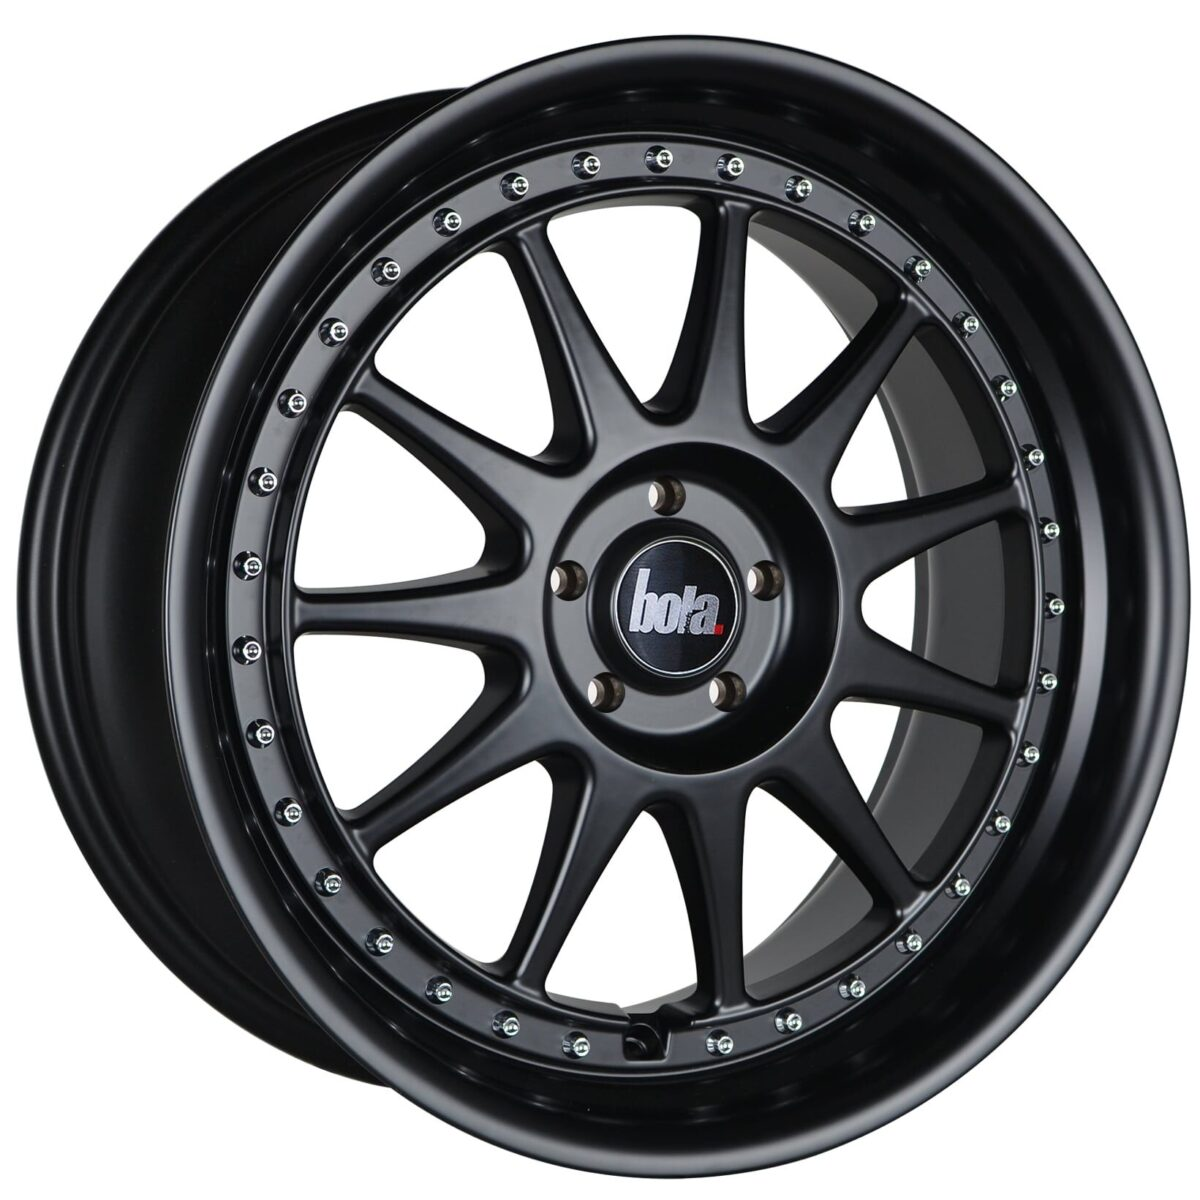 "18"" BOLA B4 Wheels - Matt Black with Silver Rivets - VW / Audi / Mercedes - 5x112"